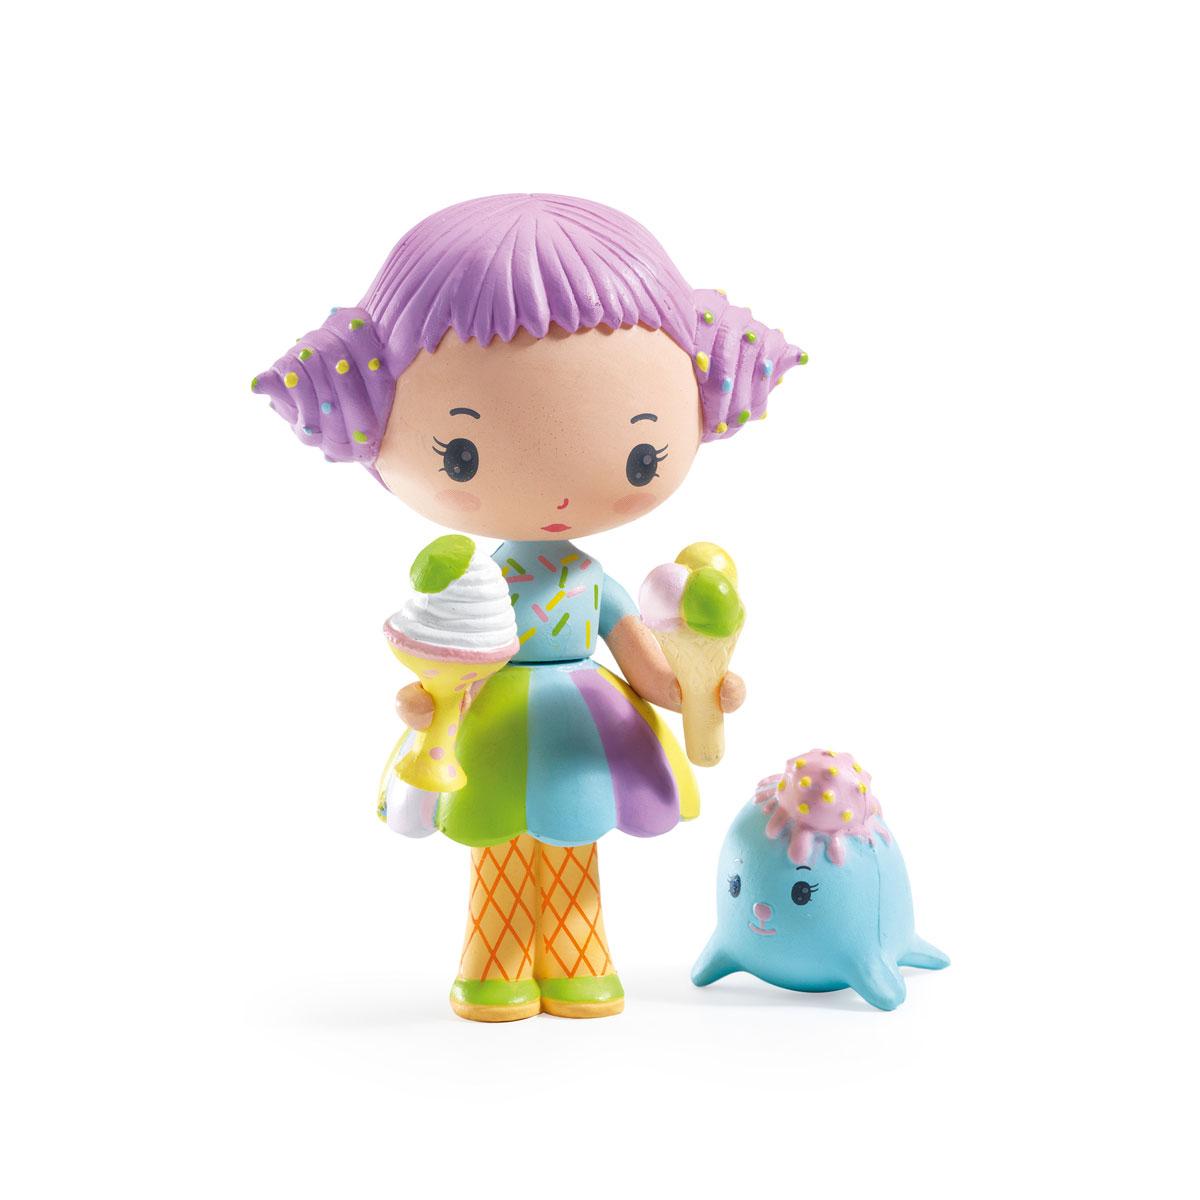 Figurine Tinyly - Tutti & Frutti